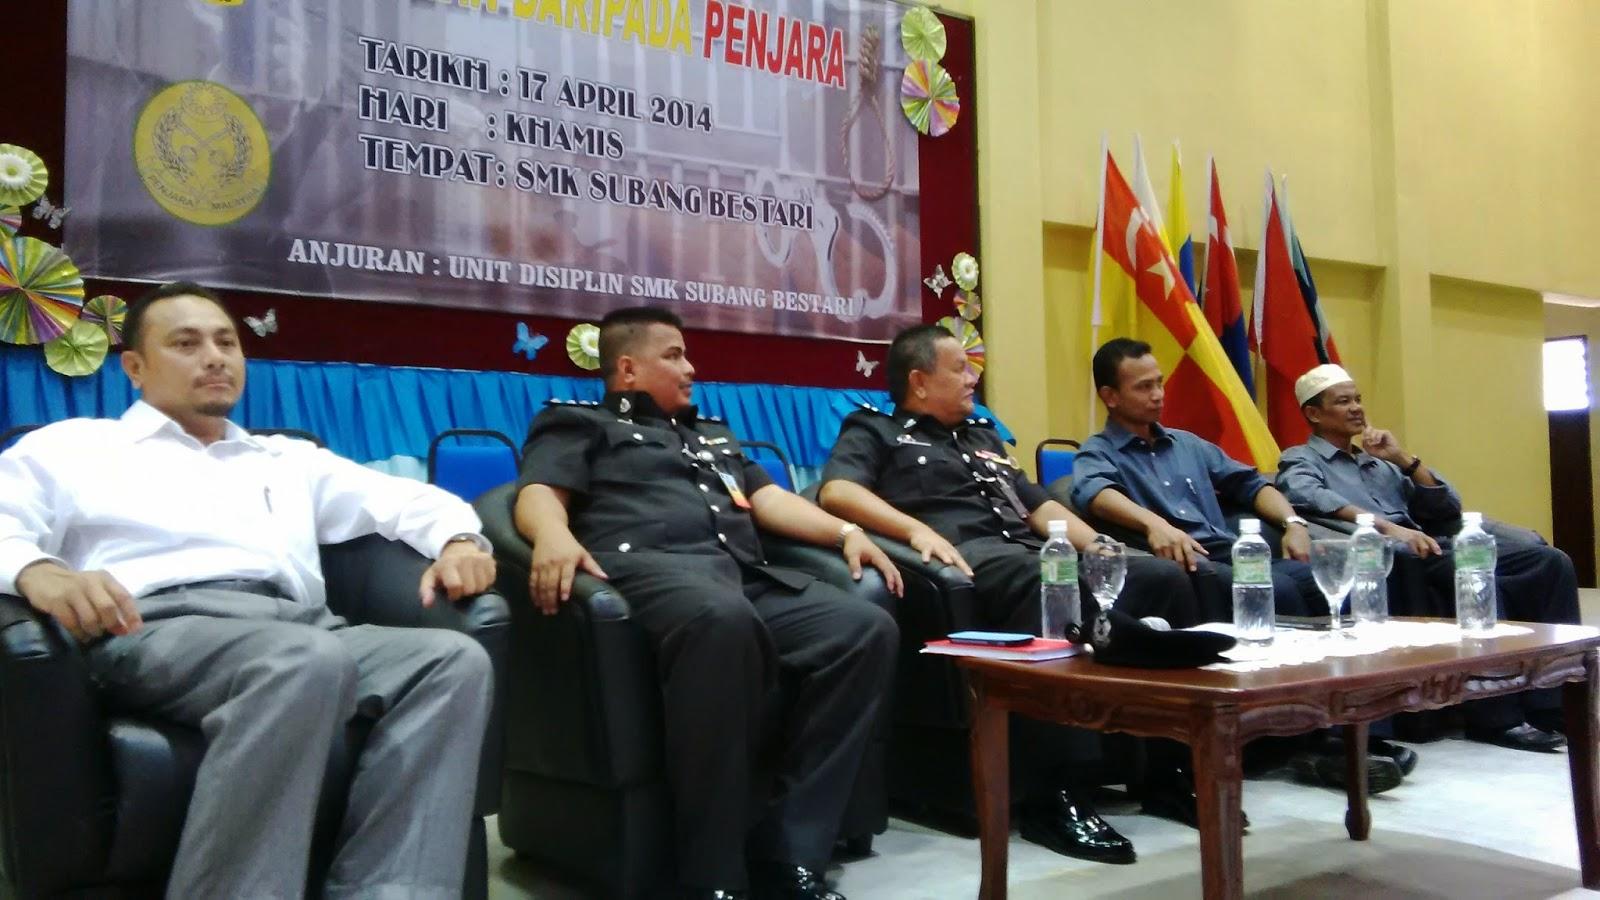 SMK Subang Bestari, Shah Alam, Selangor, PP Muhammad Nazri Nasaruddin, Parol Negeri Selangor.